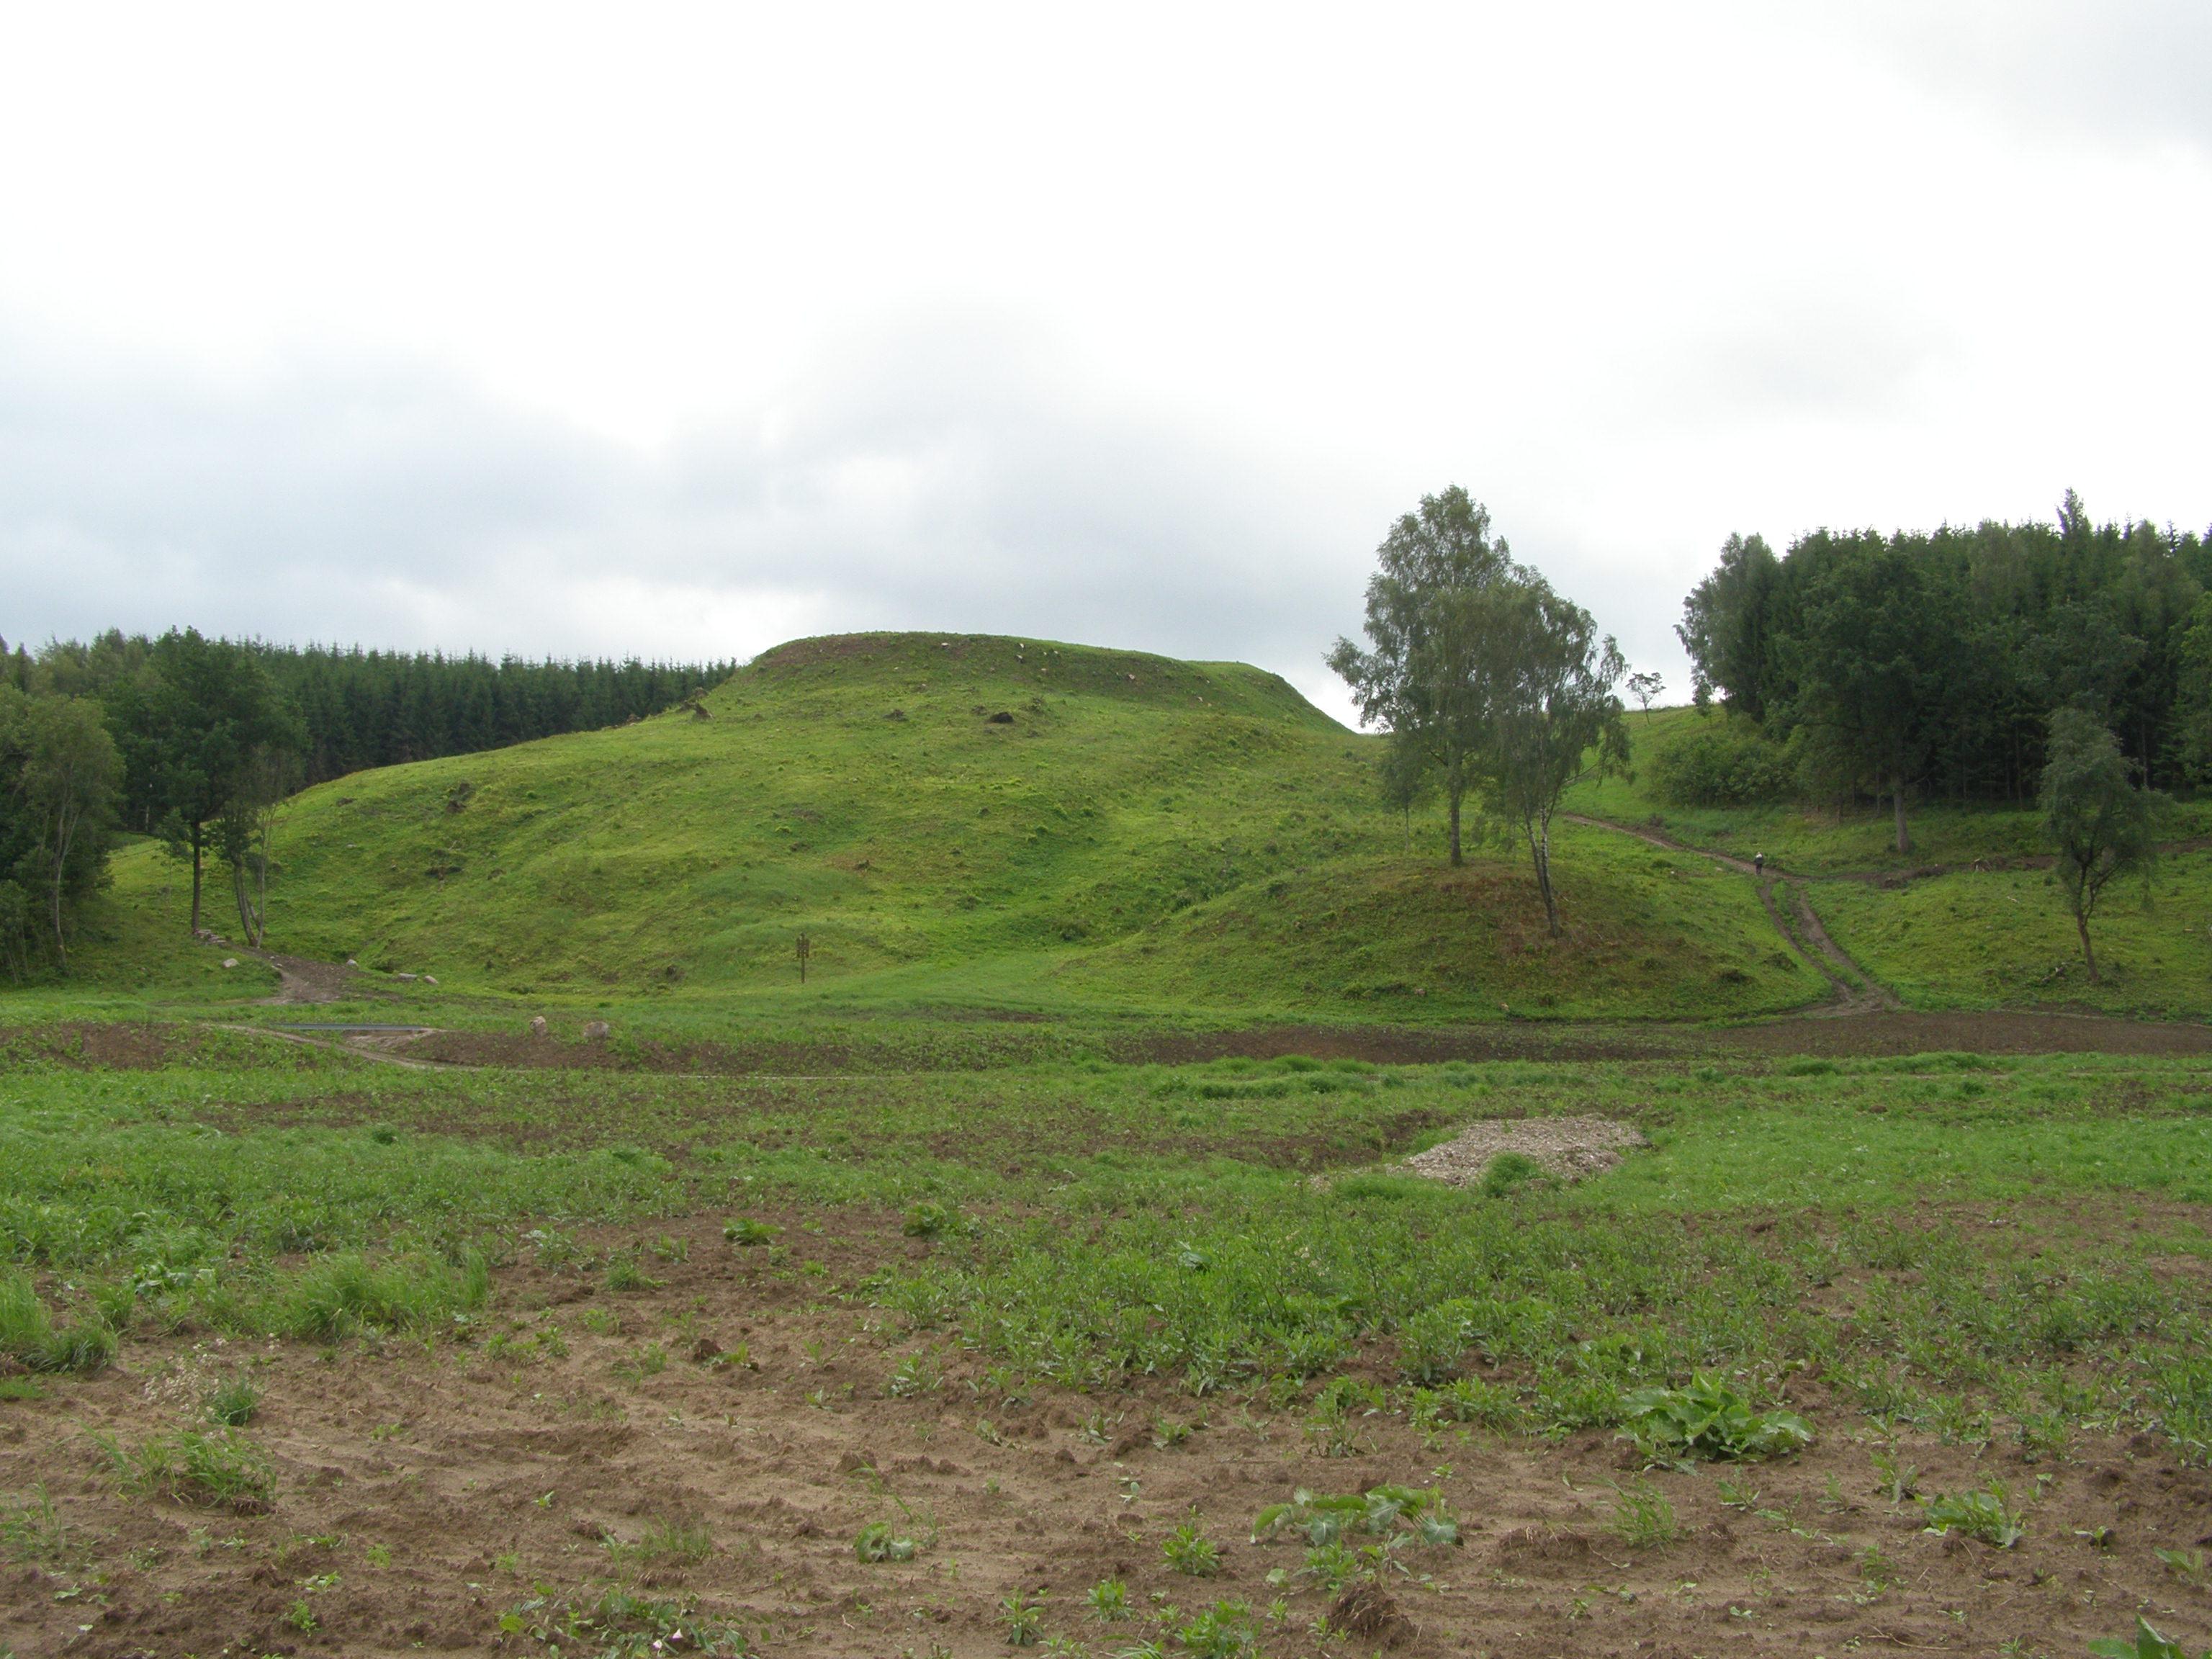 Kartenos Piliakalnis Salantu Regioninis Parkas.Kartenos Piliakalnis Vikipedija